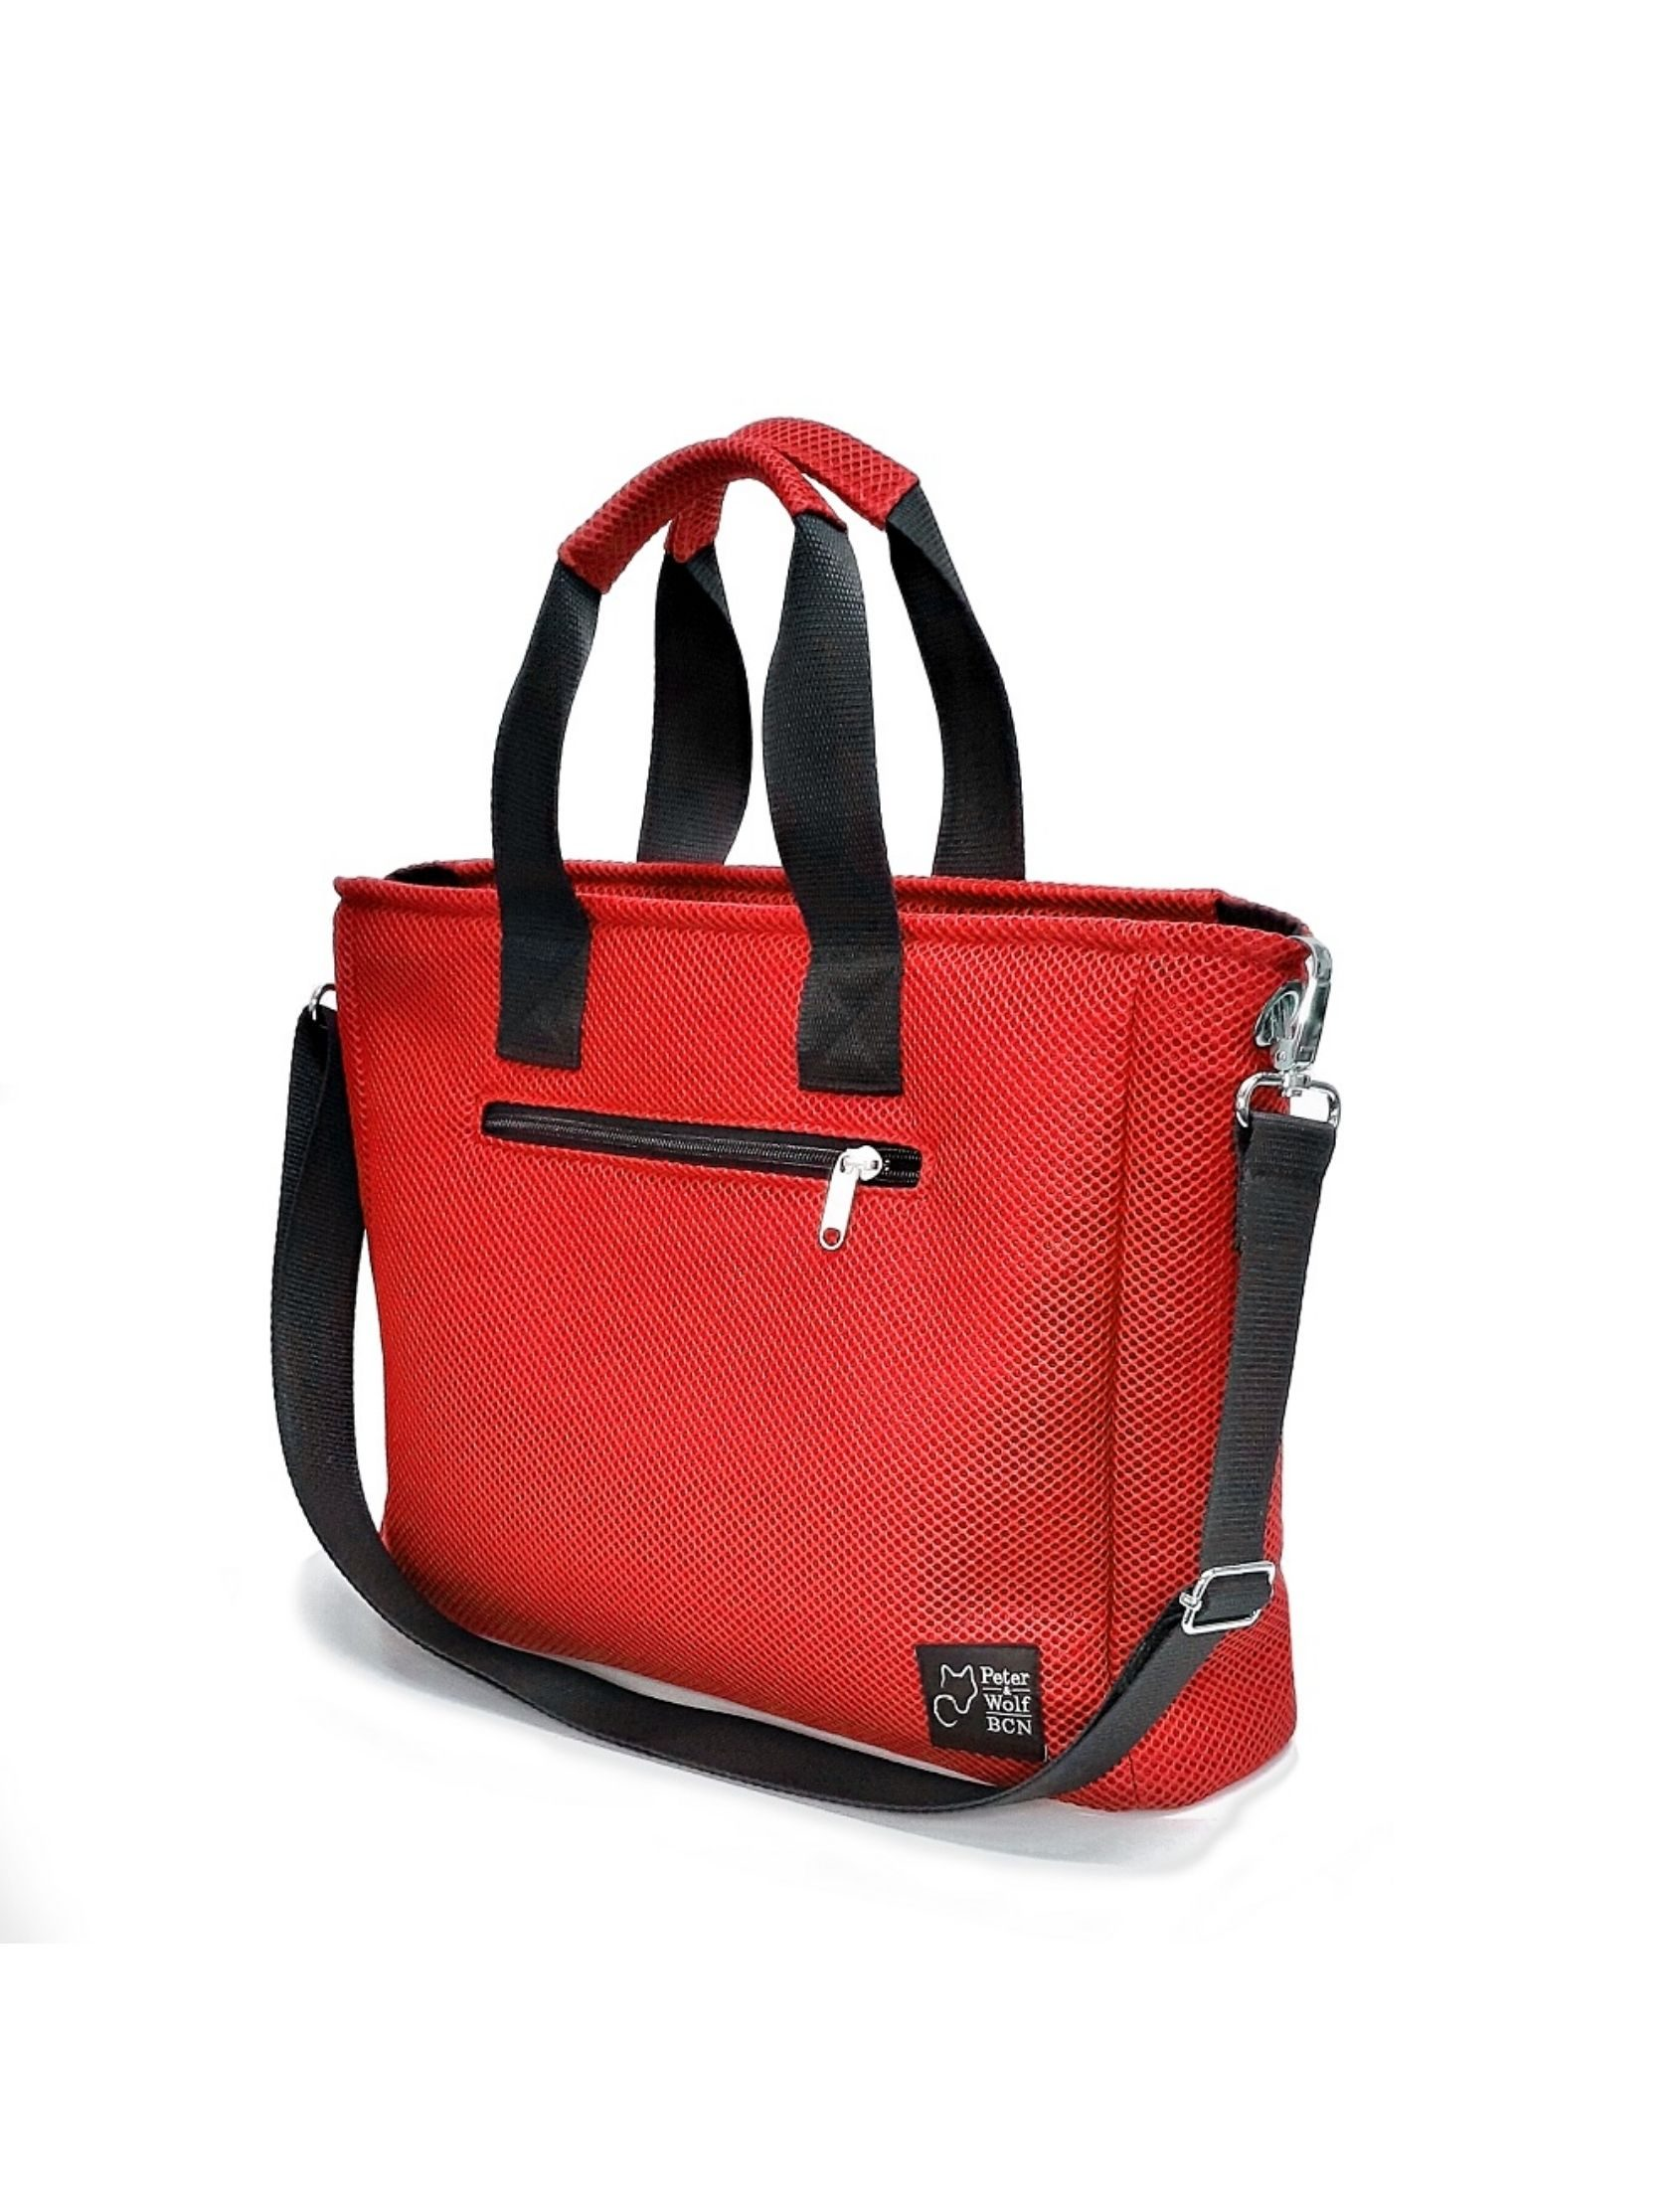 bolso box sport rojo de peter & wolf barcelona elaborado en tejido técnico 3d